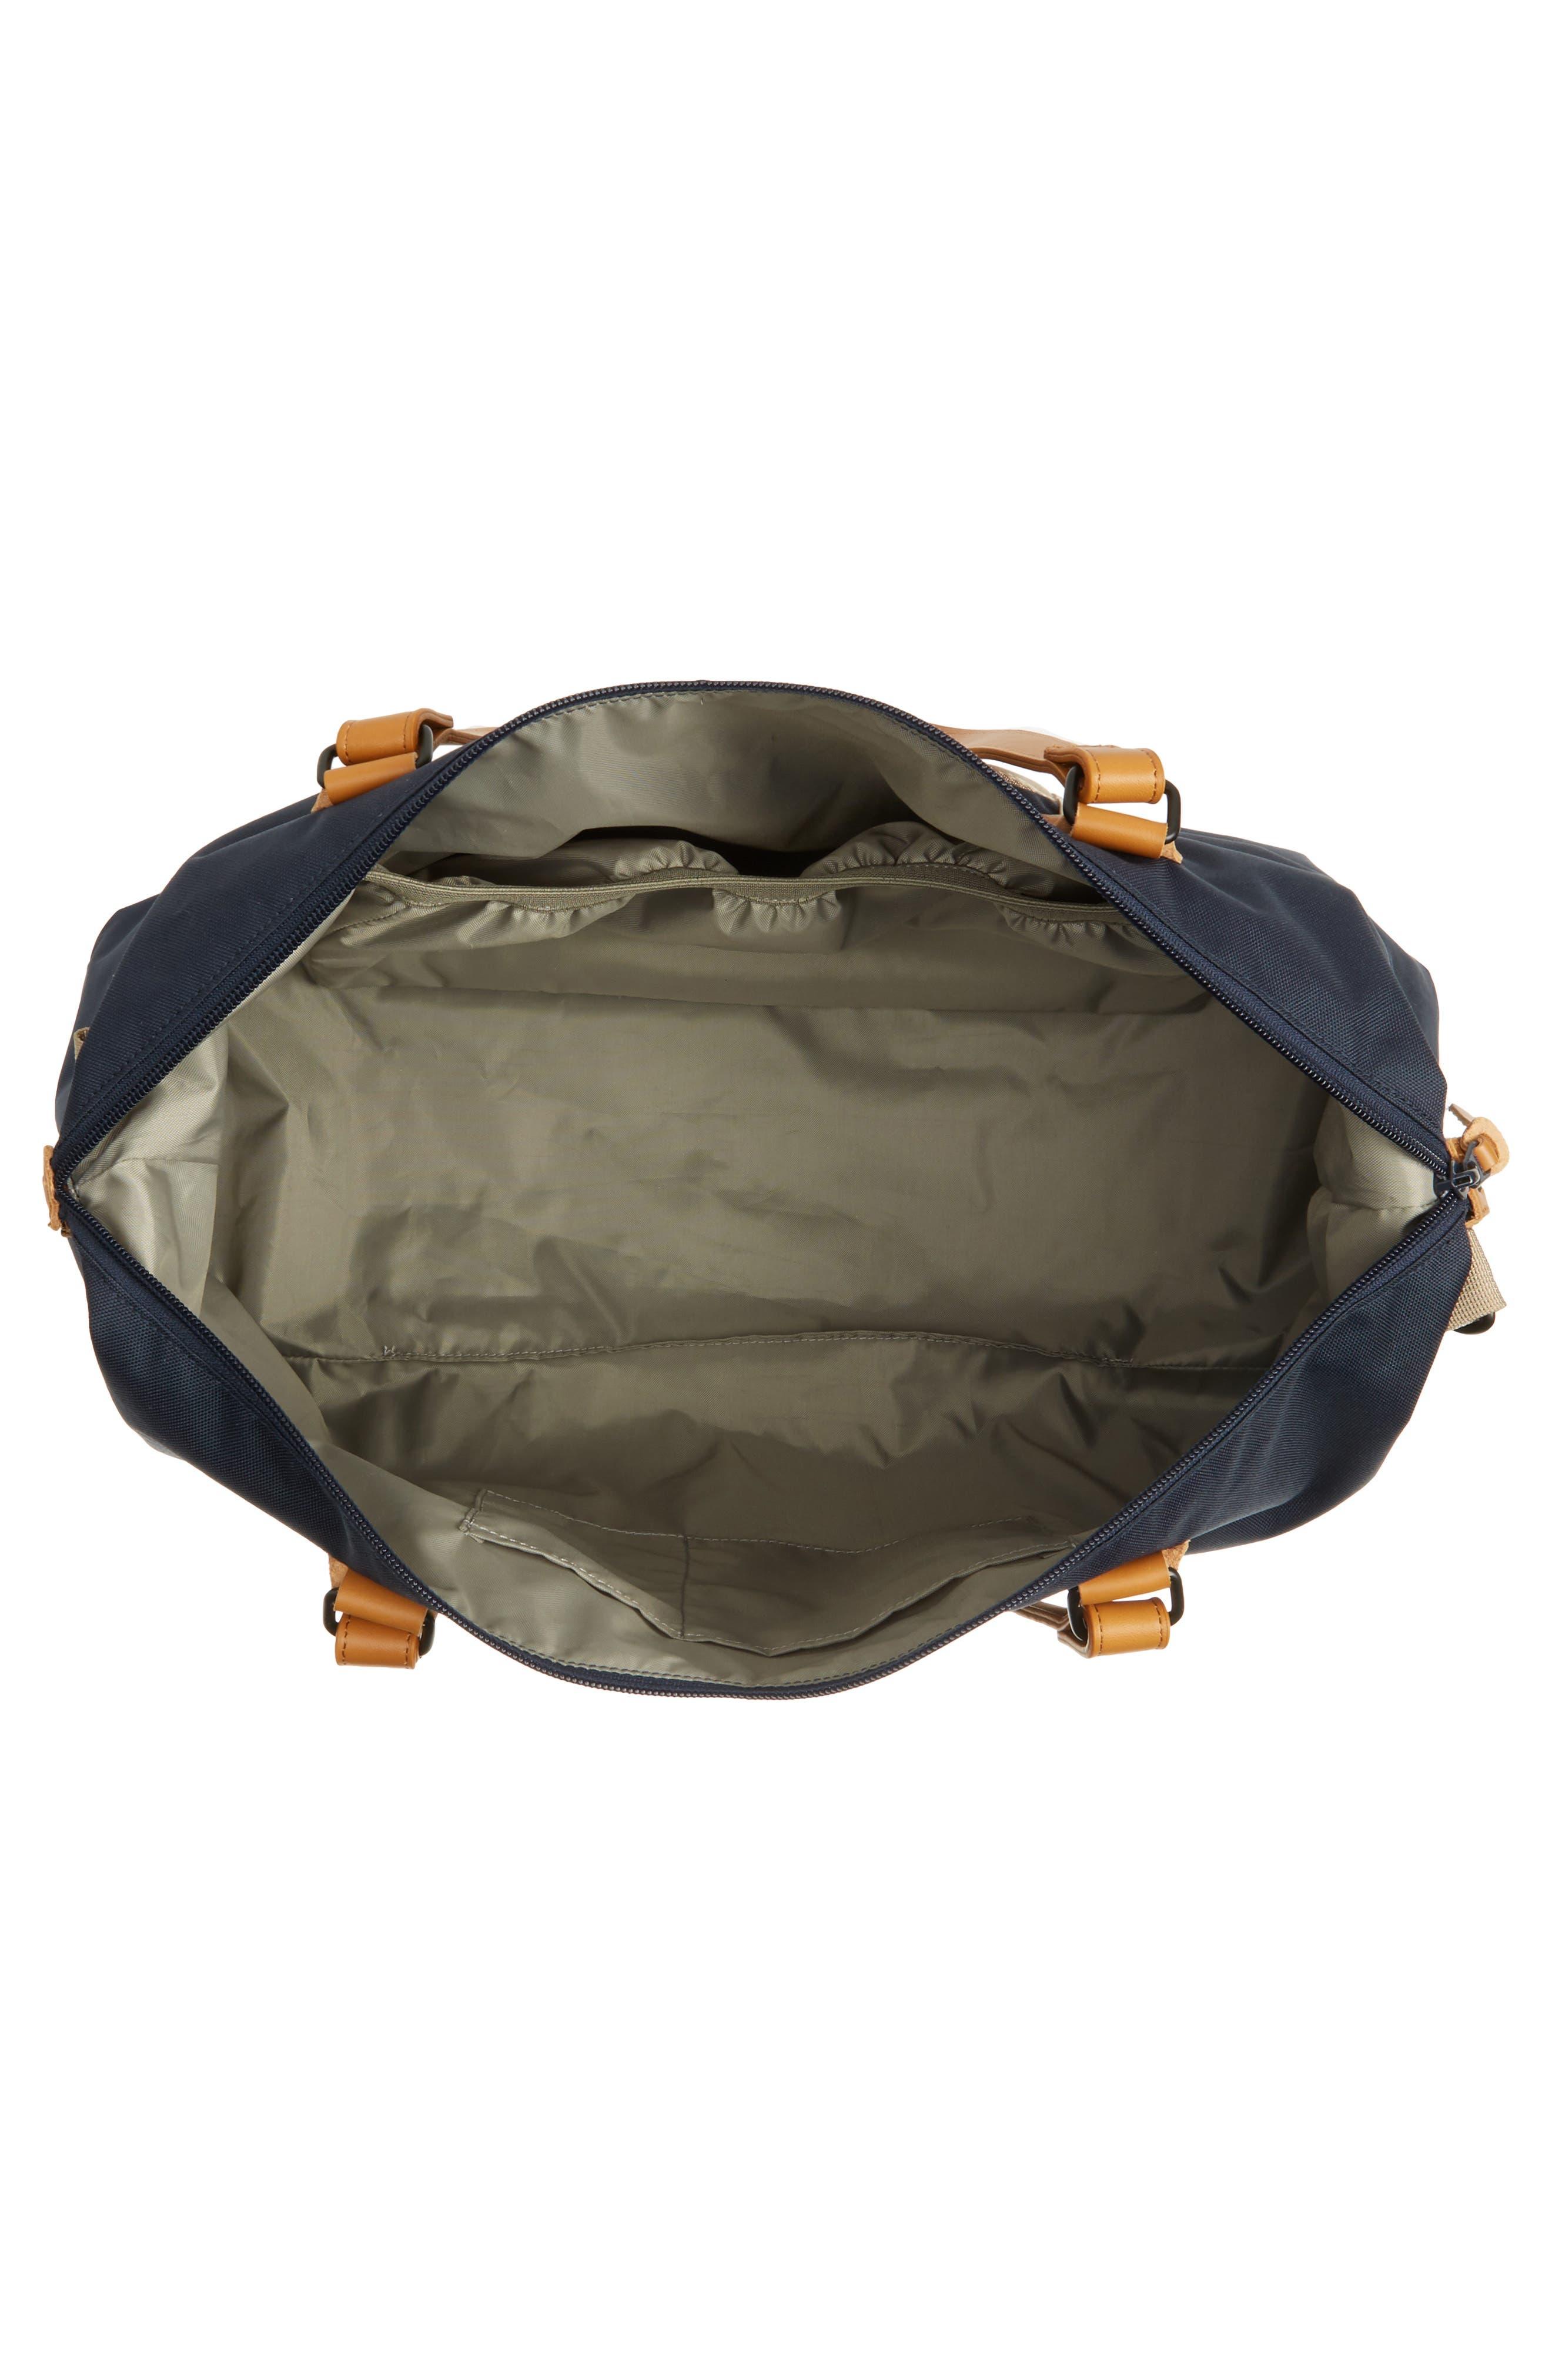 Trail Bag,                             Alternate thumbnail 4, color,                             Navy/ Forest